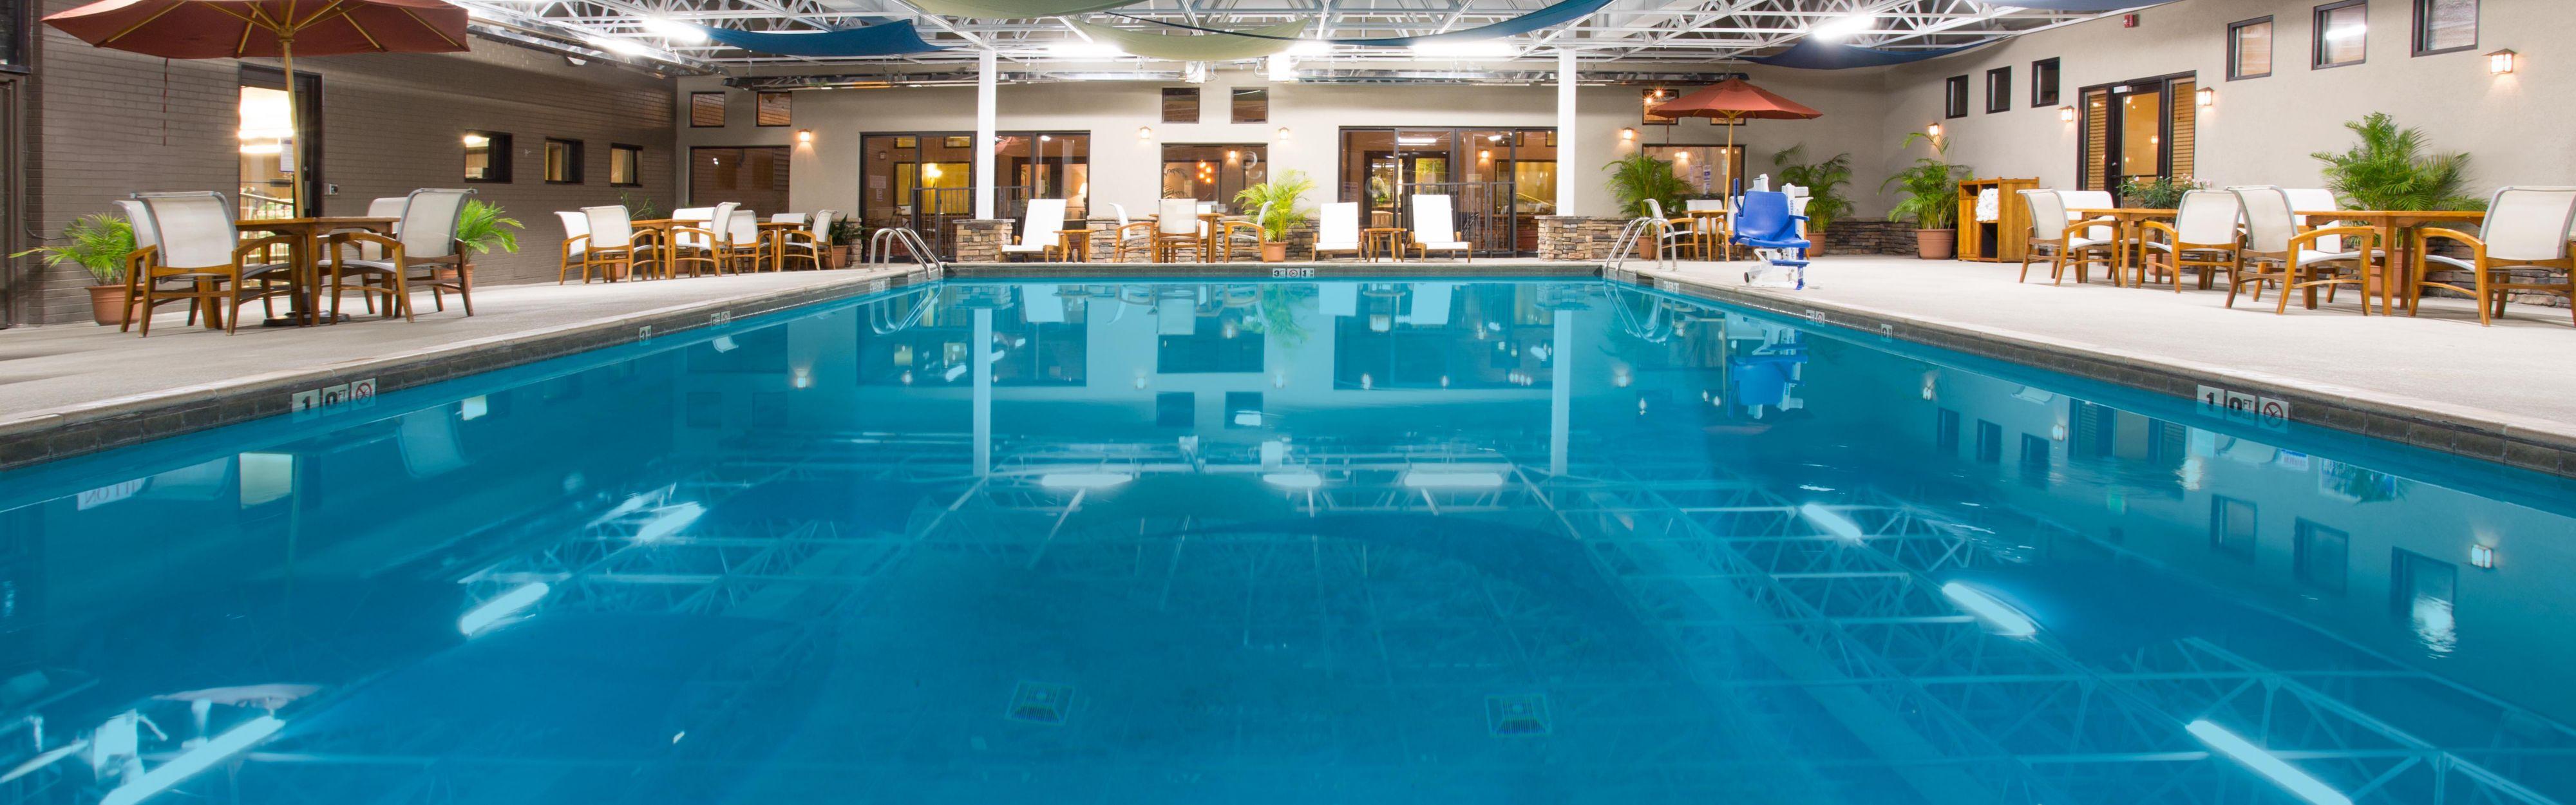 Enterprise Rent A Car Holiday Inn Denver